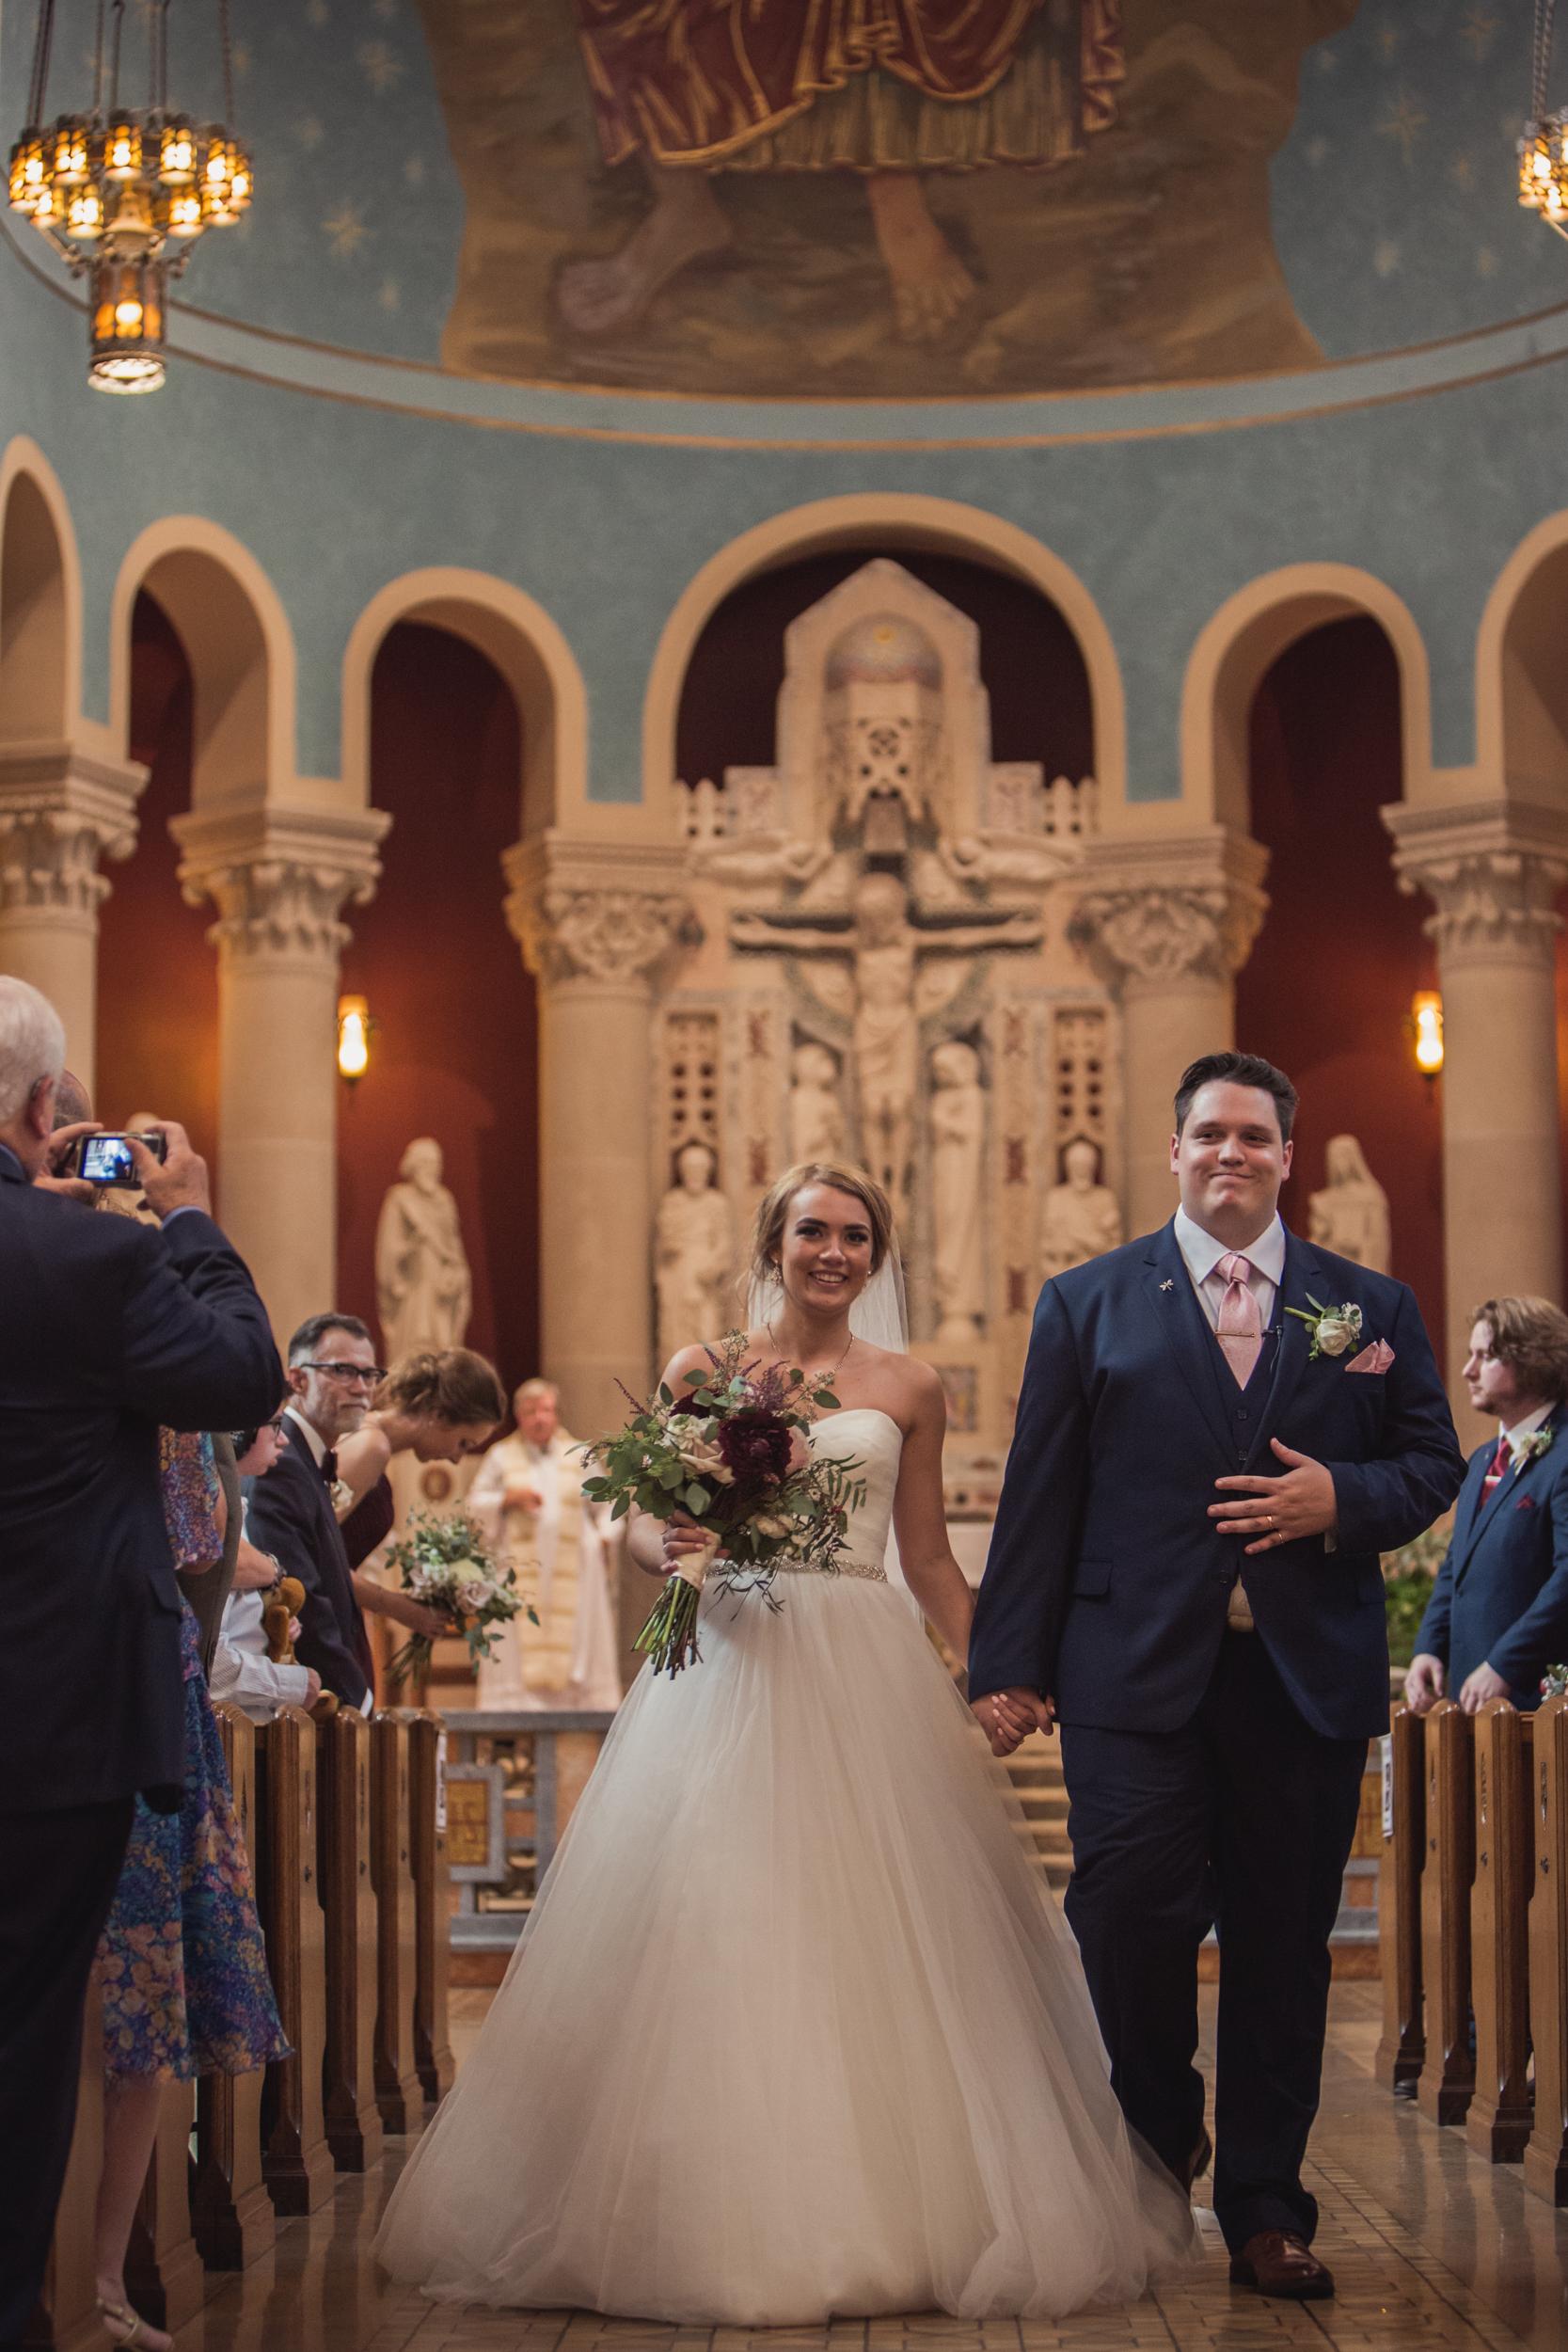 double-tree-hilton-wedding-st-paul-mn-dark-moody-photography-21.jpg